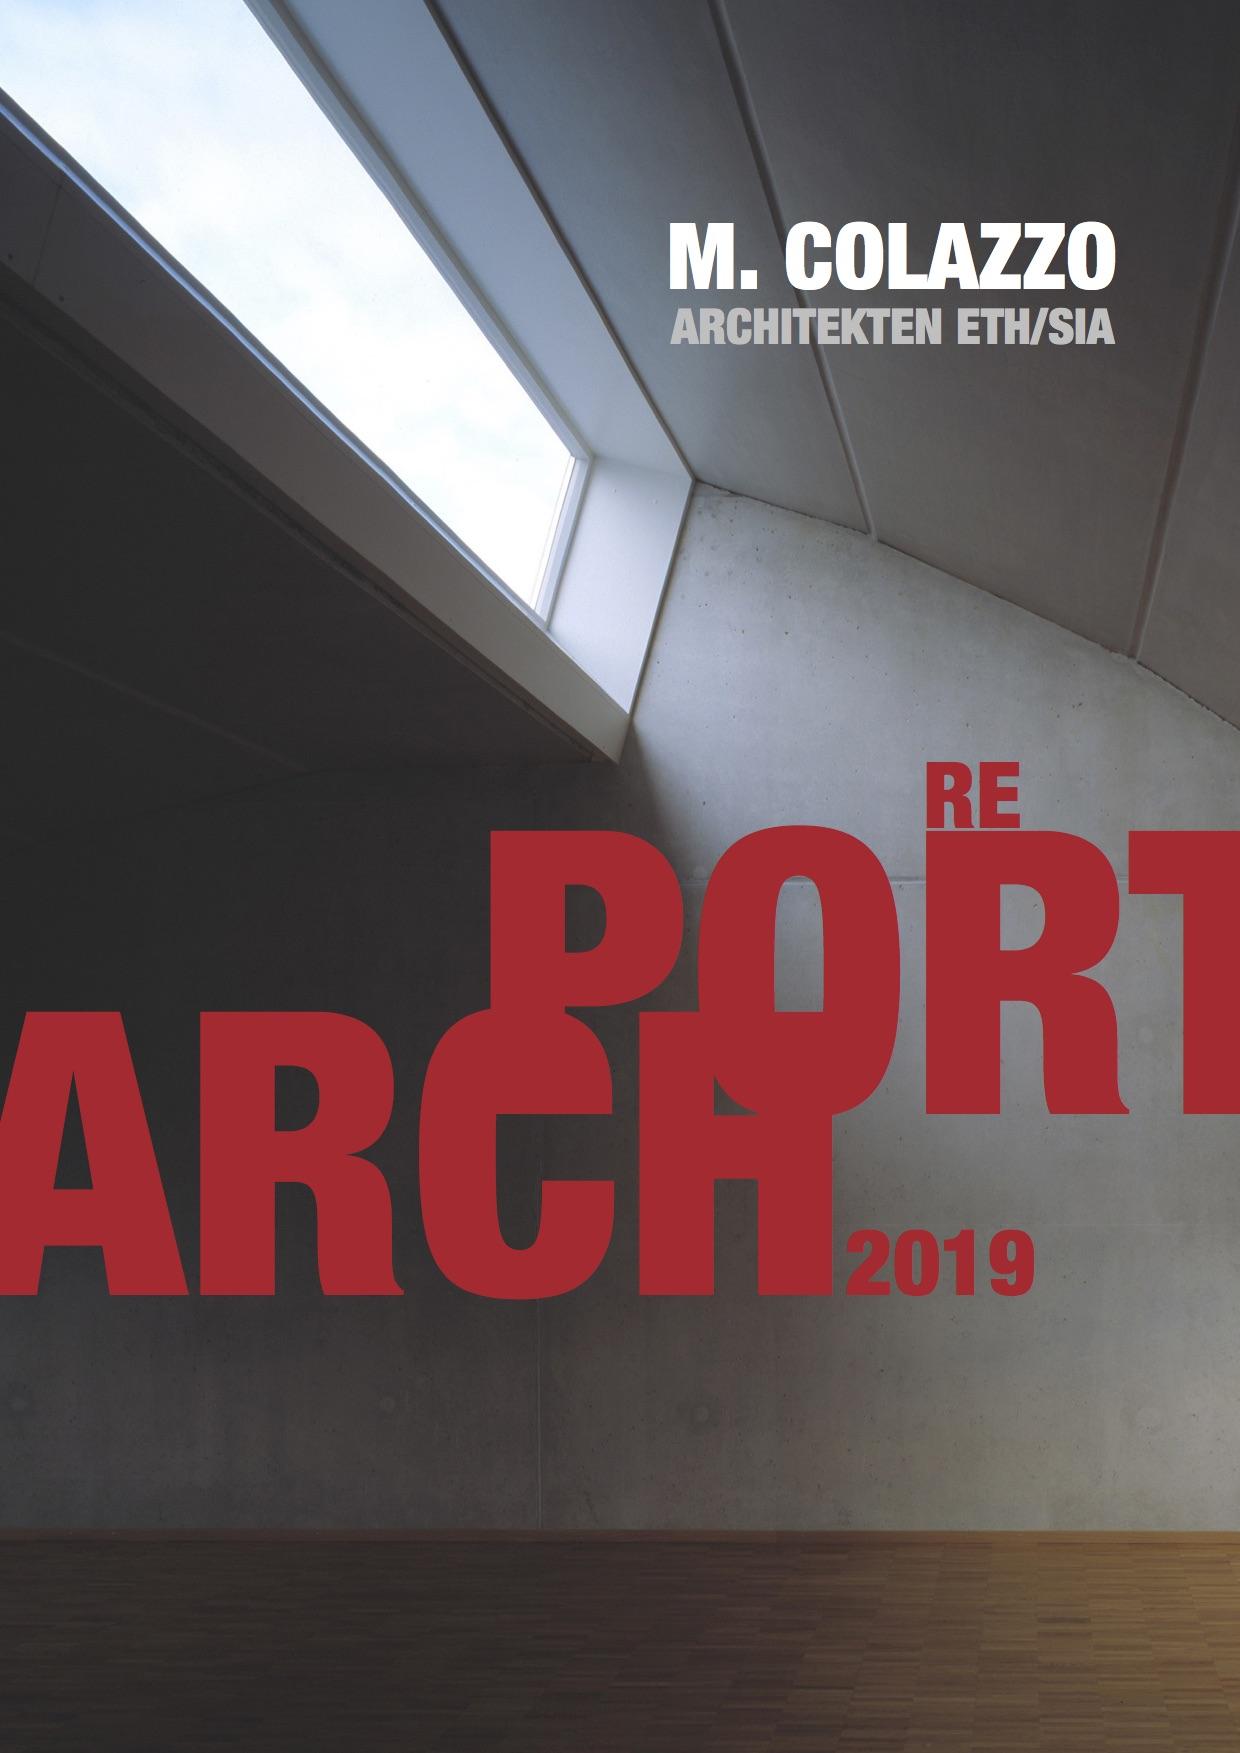 COLAZZO REPORT 2019